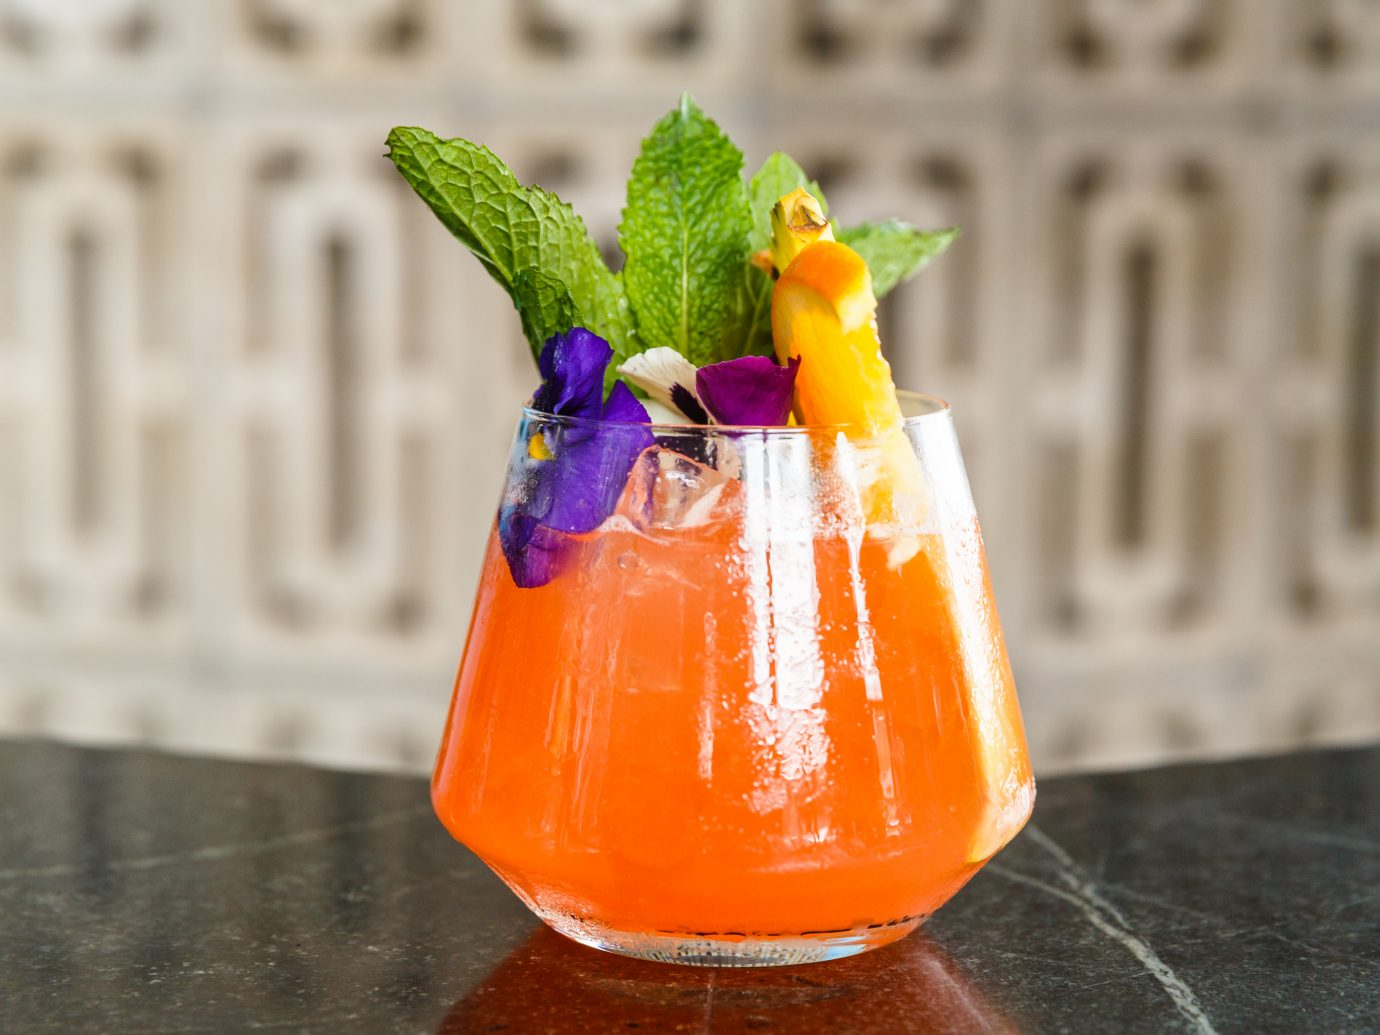 Cocktail from Gemelli's in Bushwick